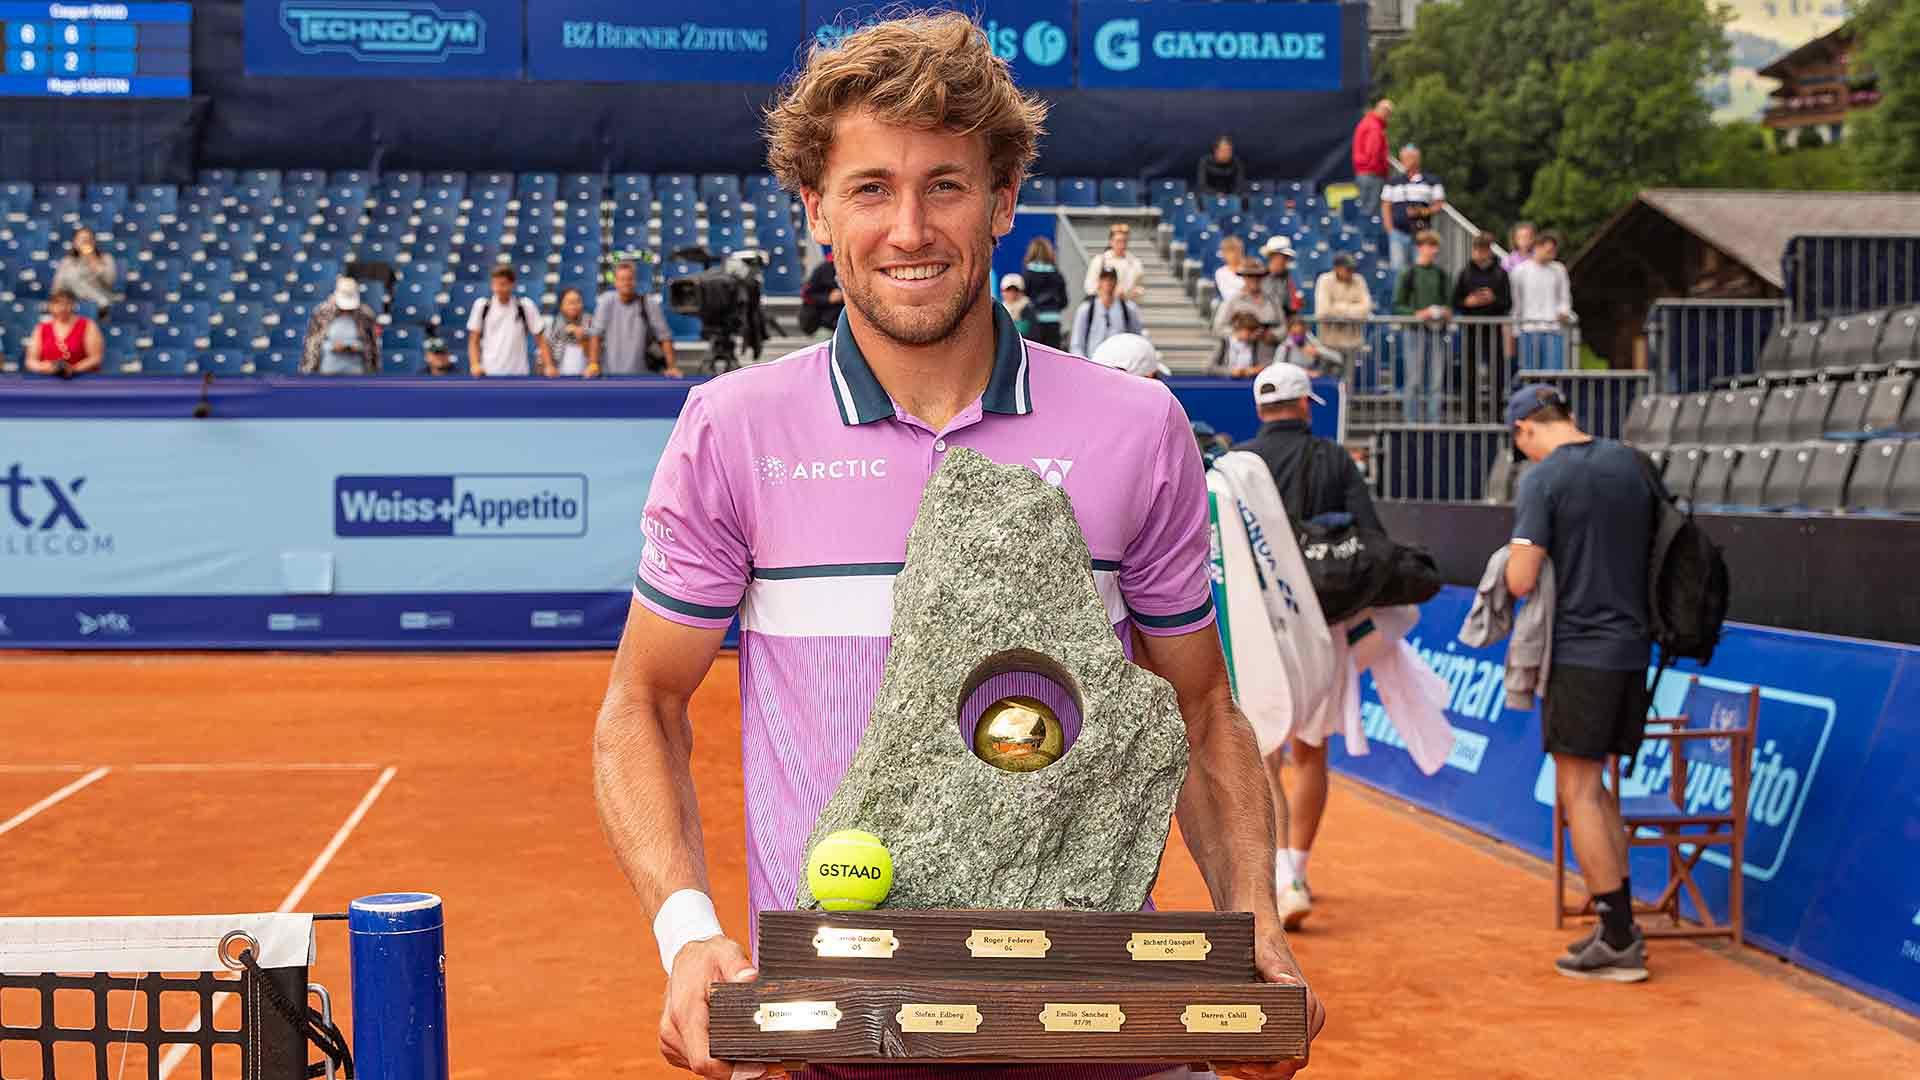 ruud gstaad final 2021 sunday - ATP Gstaad: Ruud do tretjega naslova letos